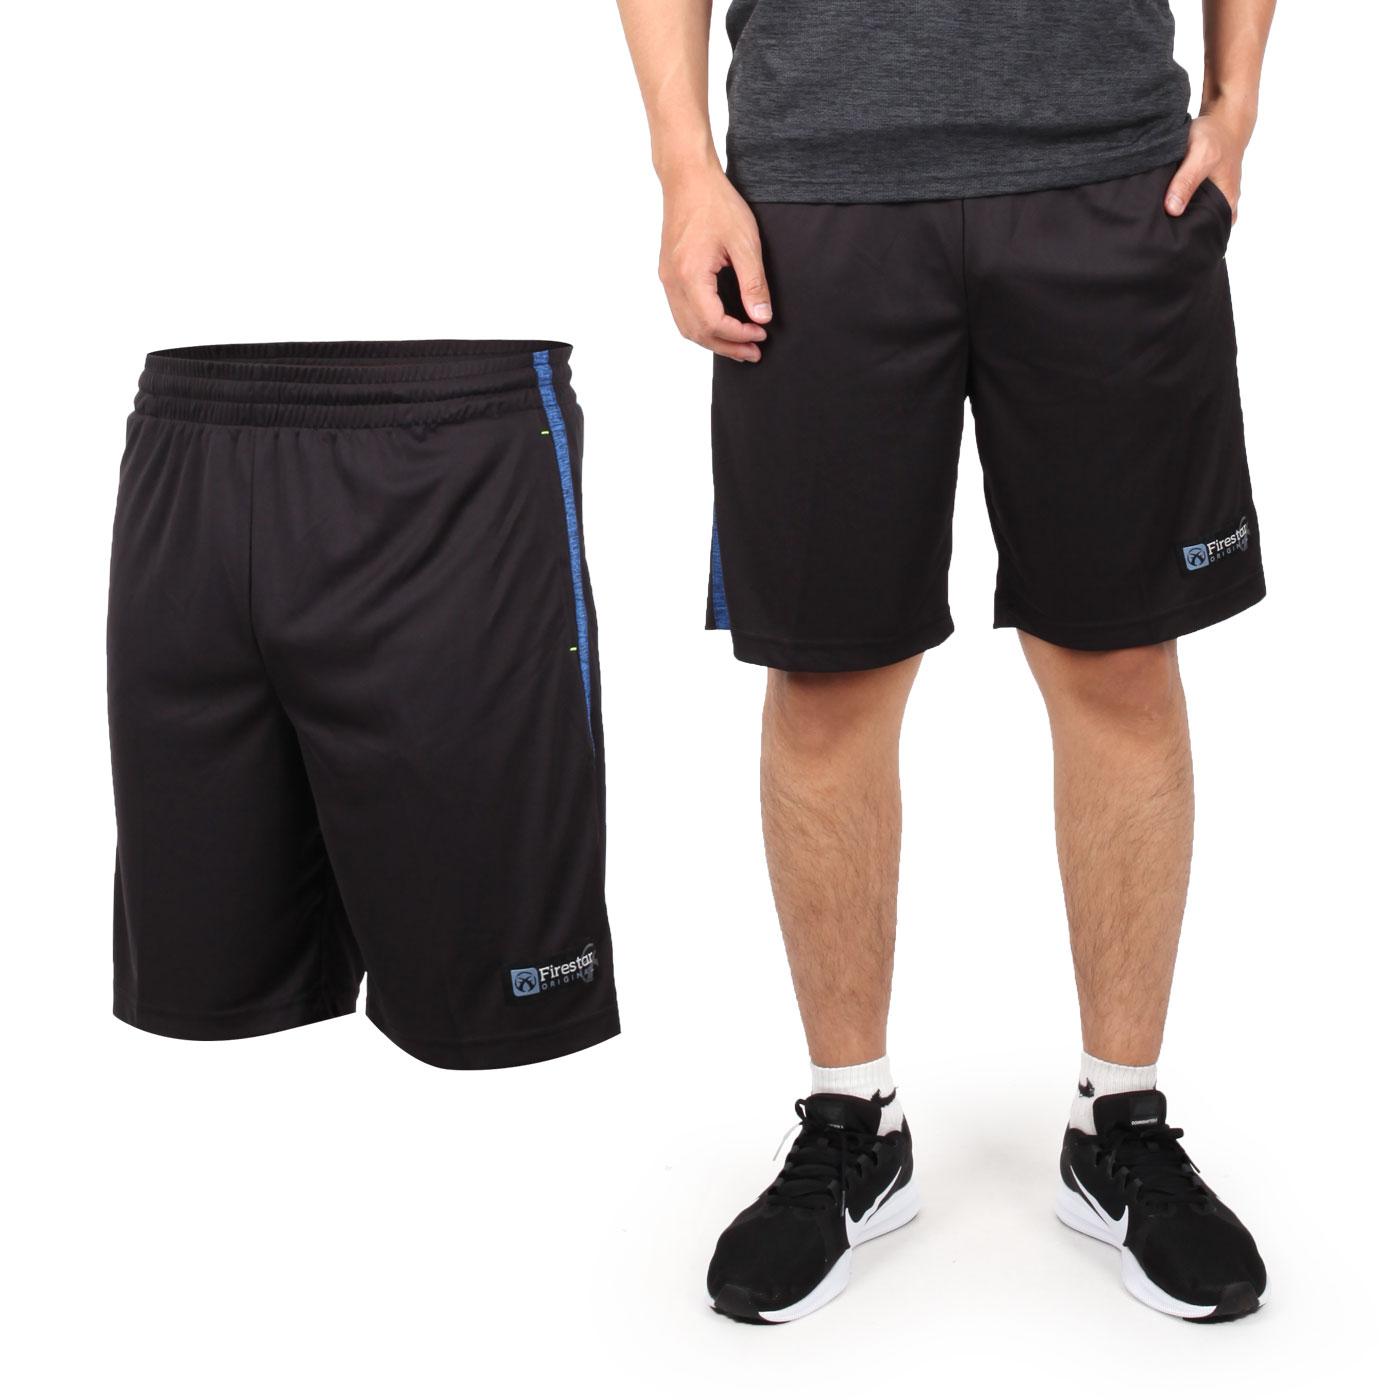 FIRESTAR 男款吸排籃球褲 B8002-18 - 黑藍